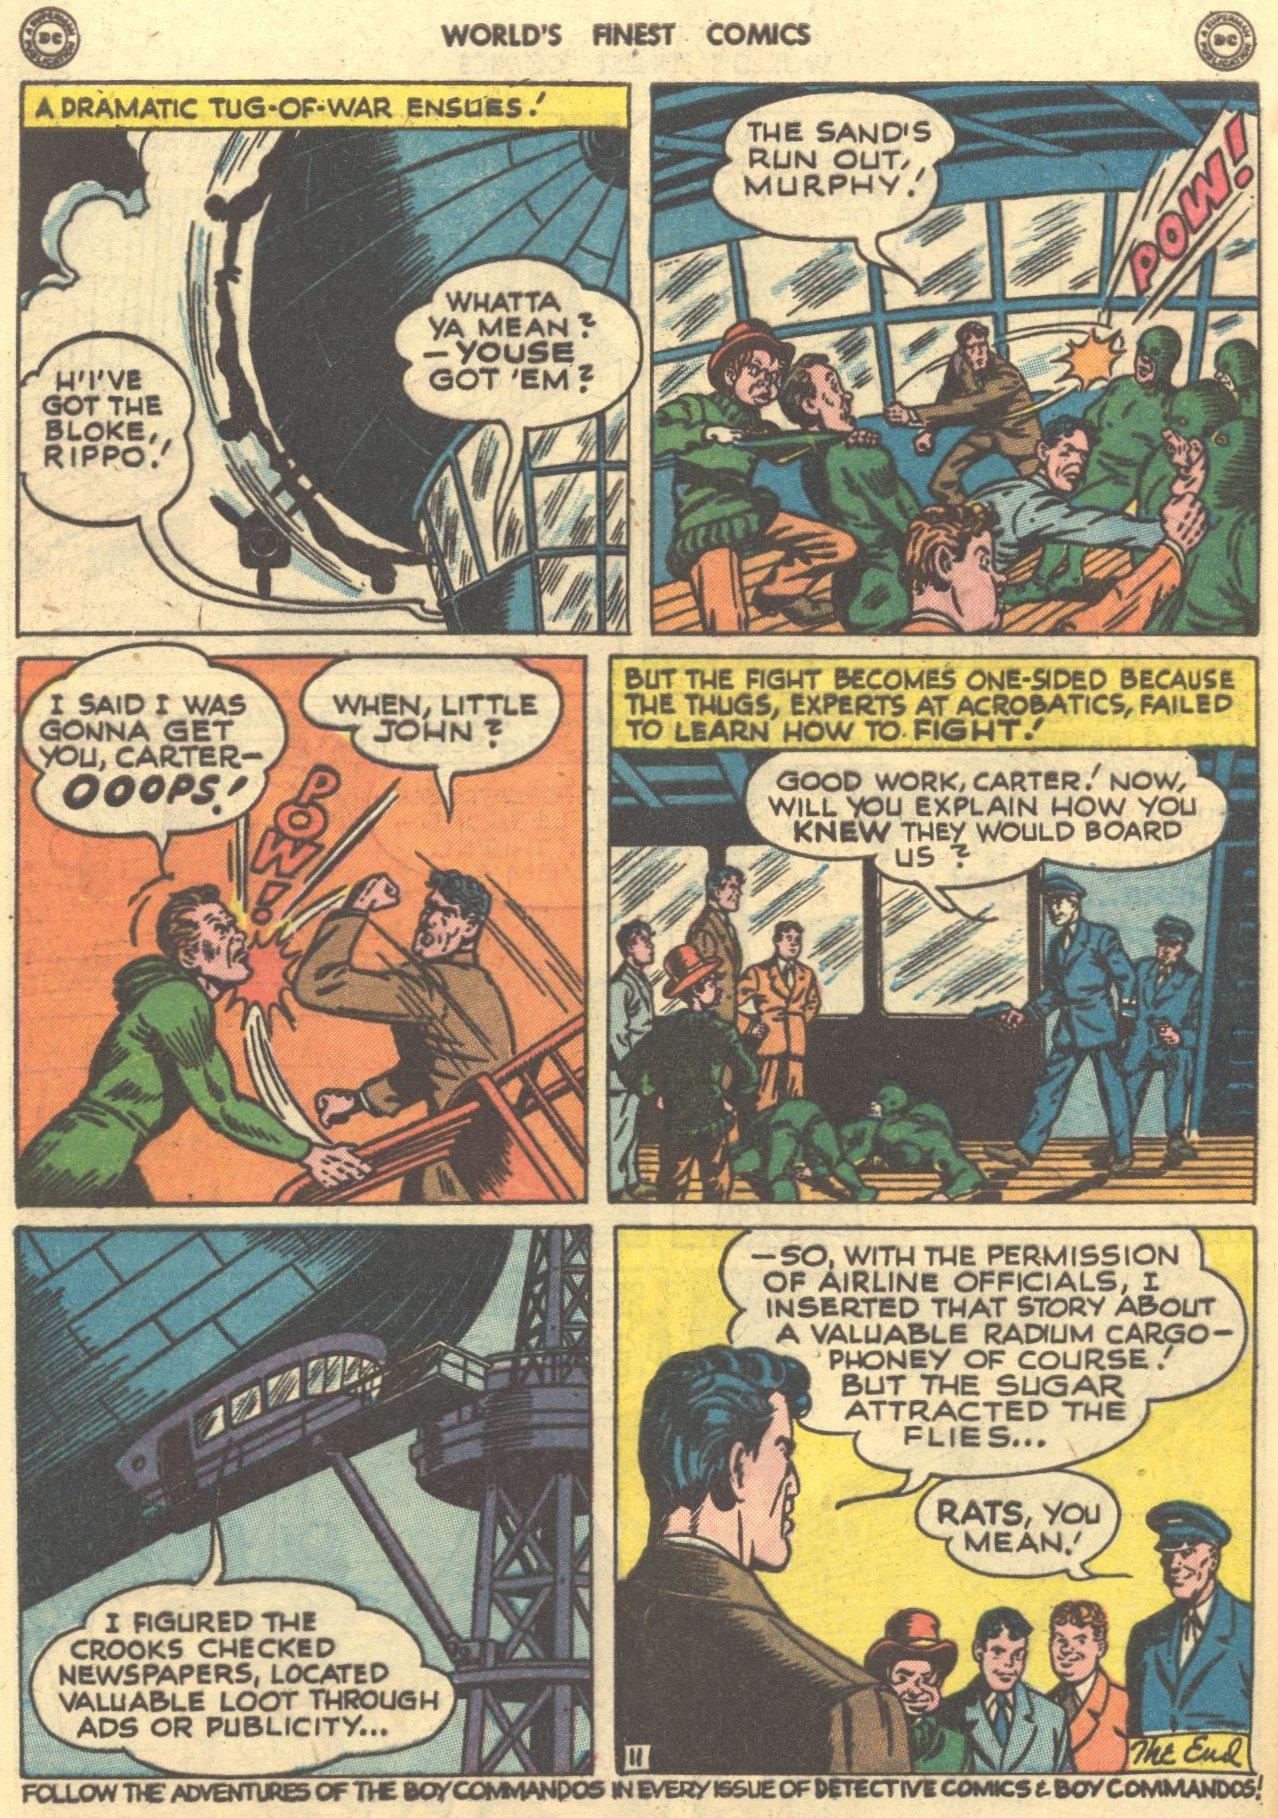 Read online World's Finest Comics comic -  Issue #28 - 39